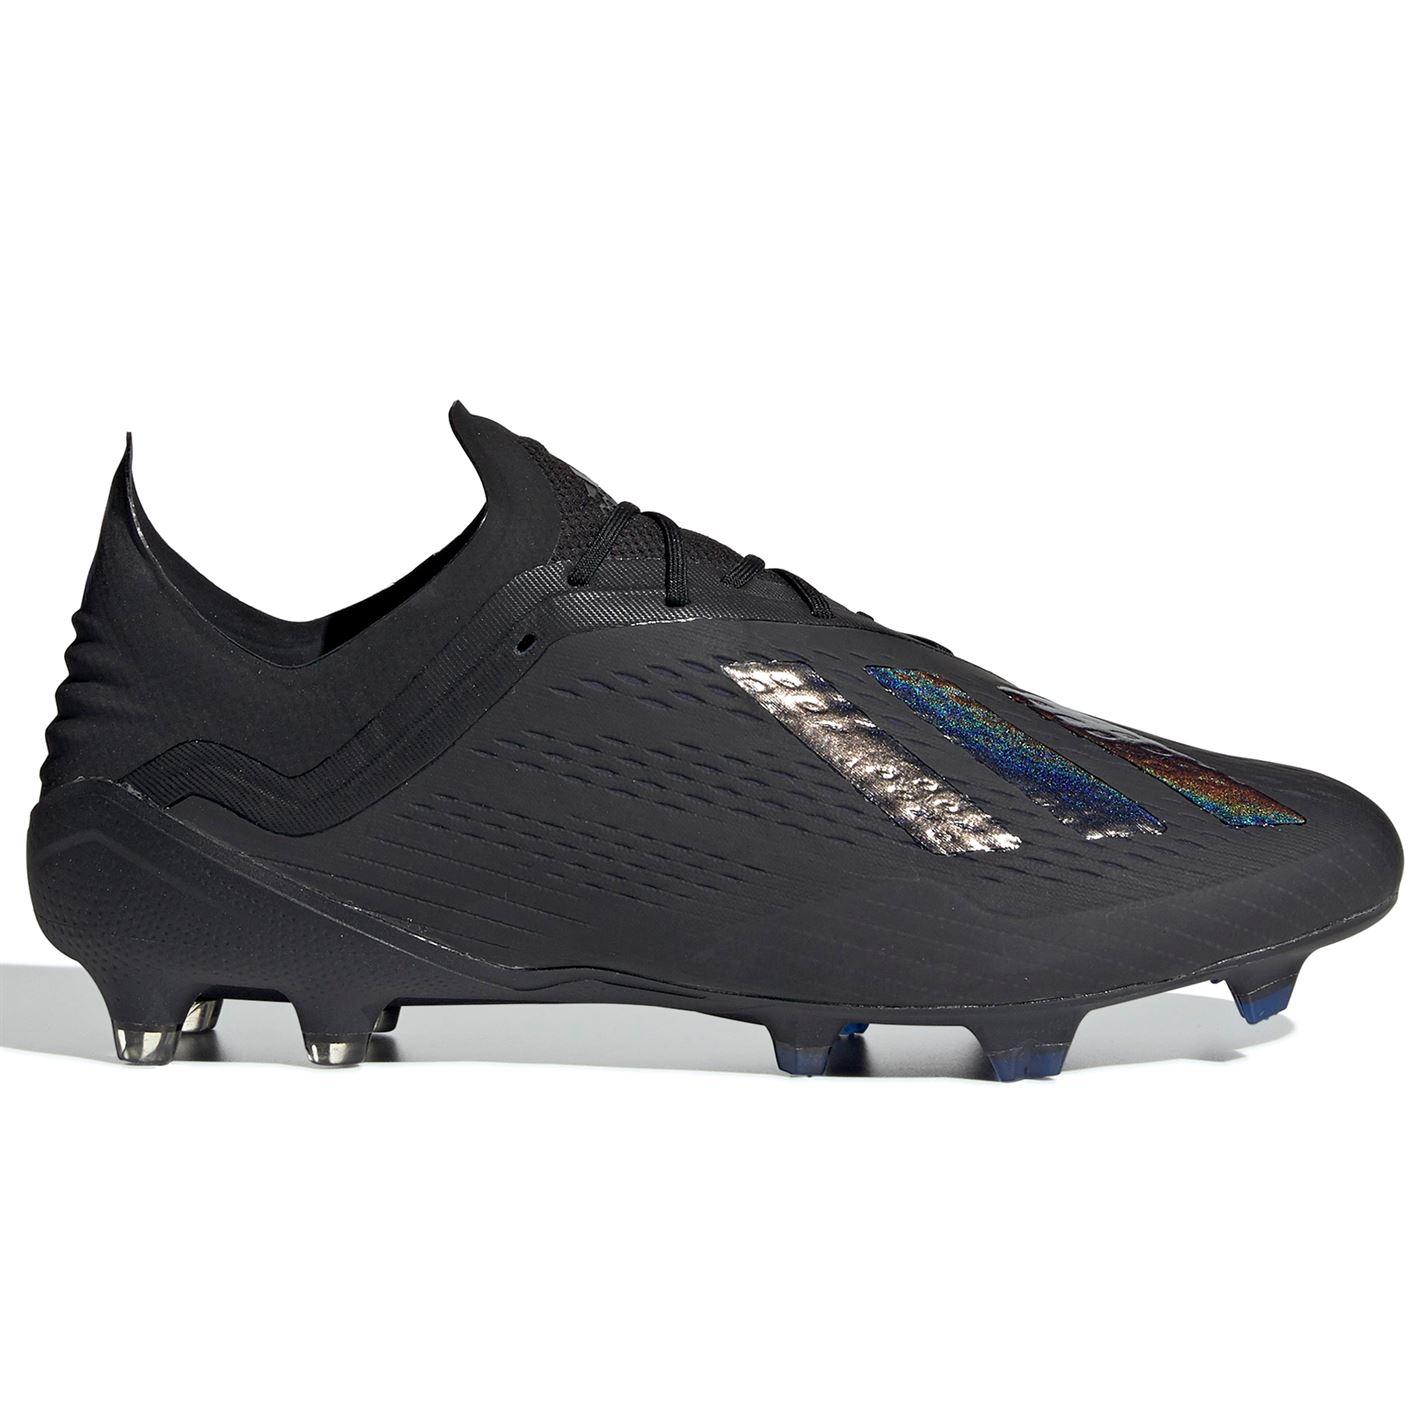 kopačky adidas X 15.3 Leather Firm Ground pánské